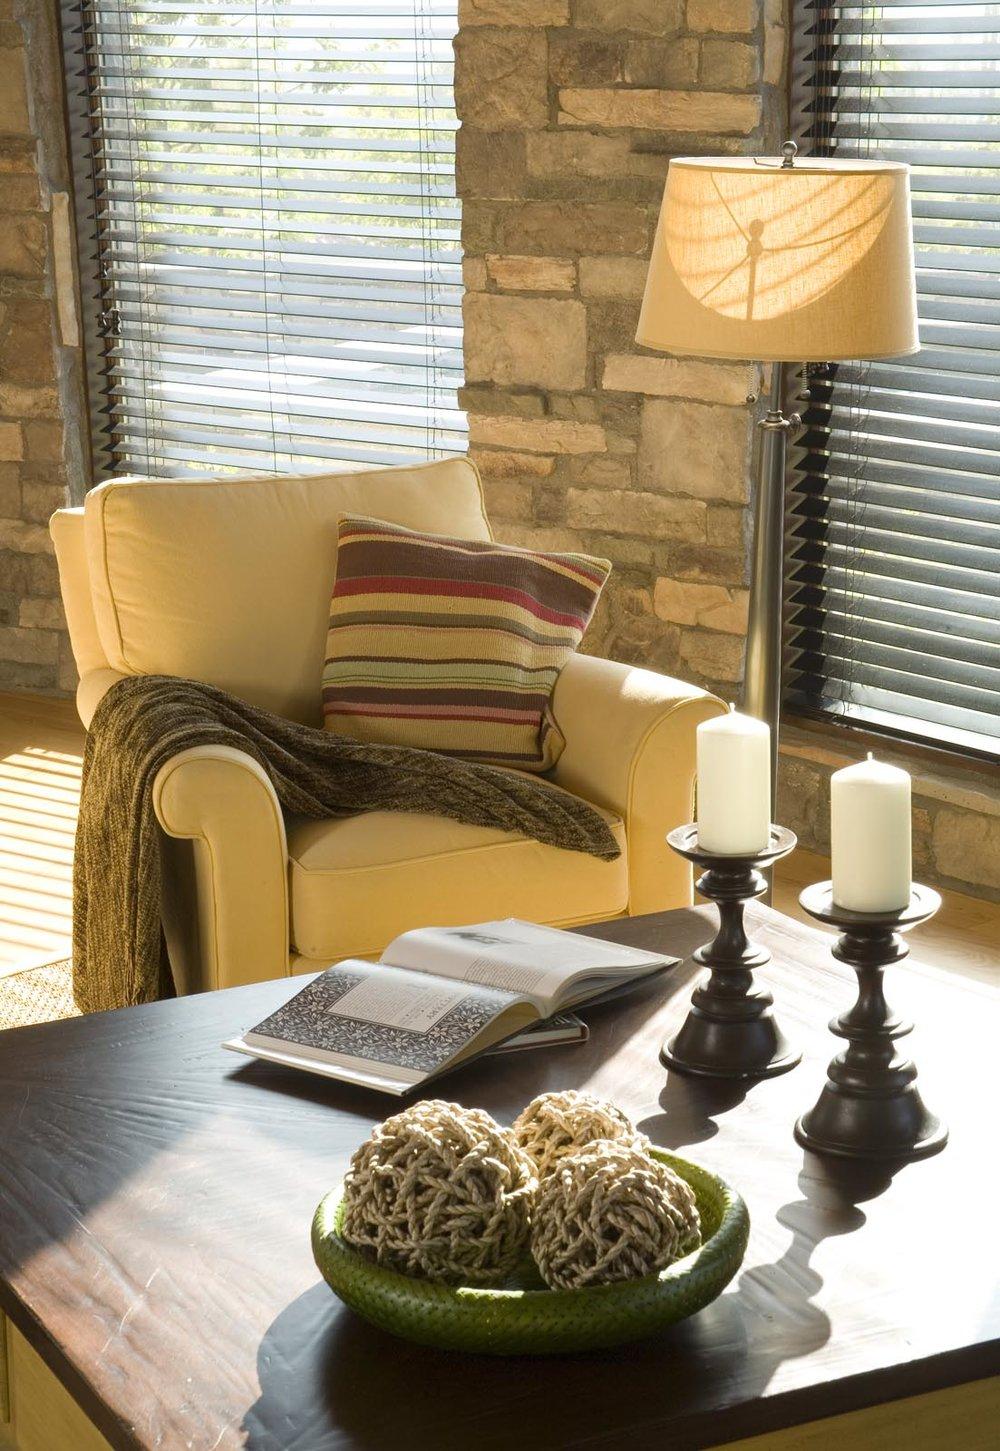 H7_furnishings.jpg